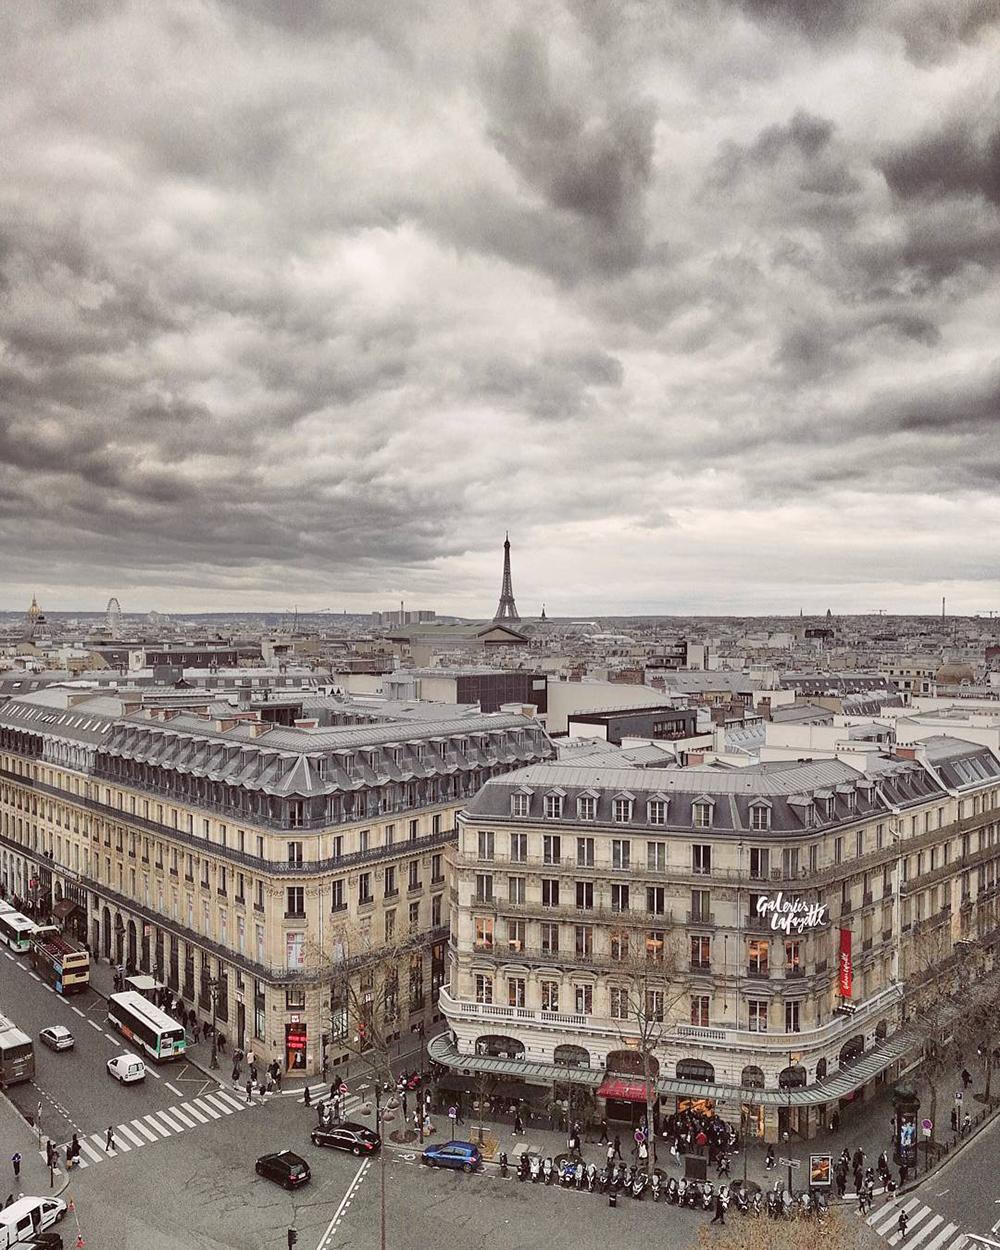 viste e terrazze panoramiche gratuite a Parigi